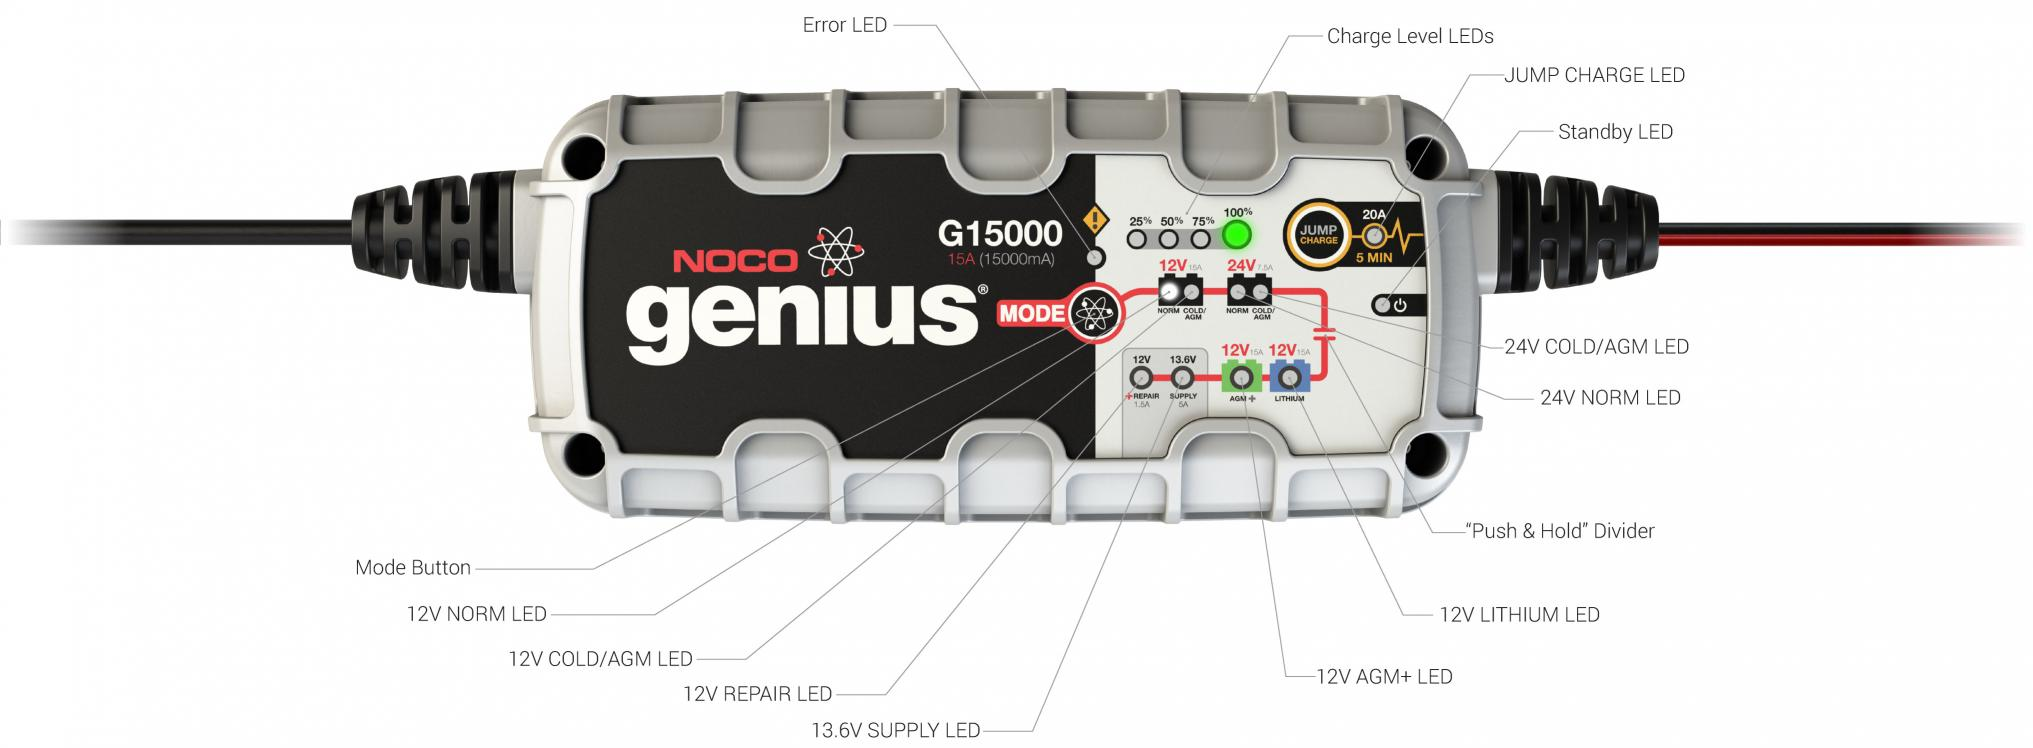 g15000-12v-24v-automotive-car-battery-charger-agm-deep-cycle-lithium-desulfator.jpg